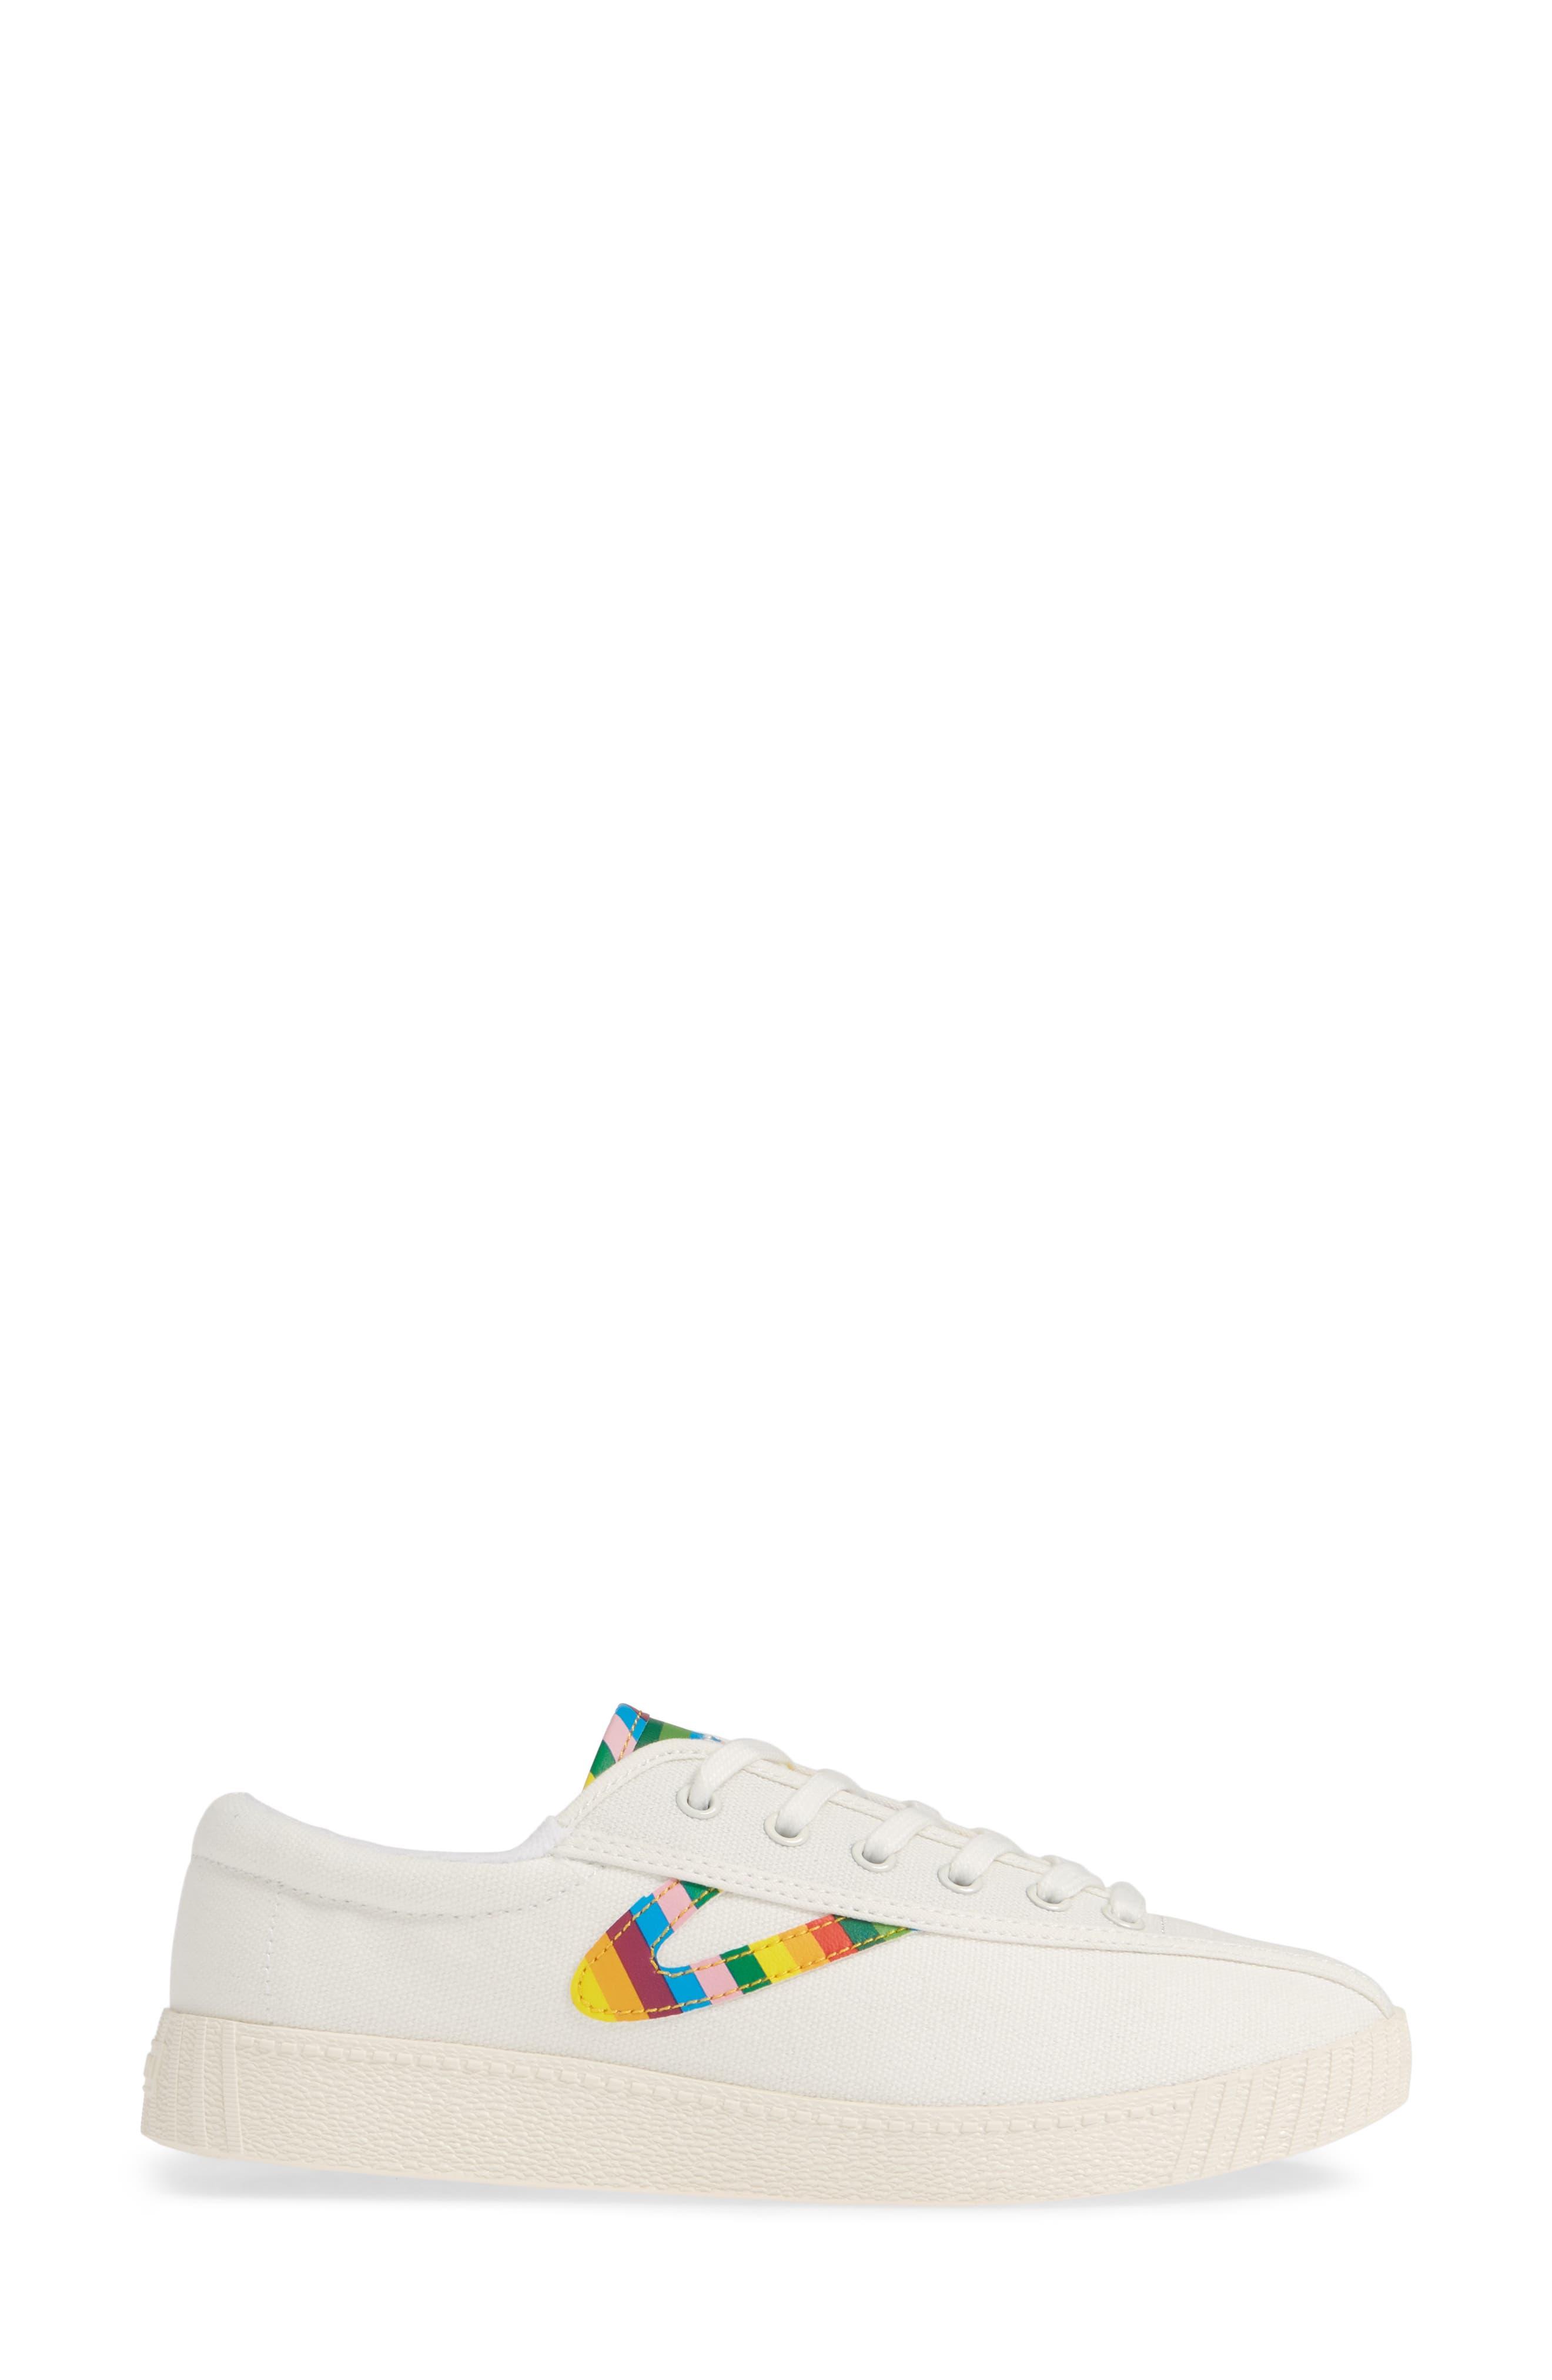 ,                             Nylite 28 Plus Sneaker,                             Alternate thumbnail 3, color,                             VINTAGE WHITE/ CLASSIC MULTI